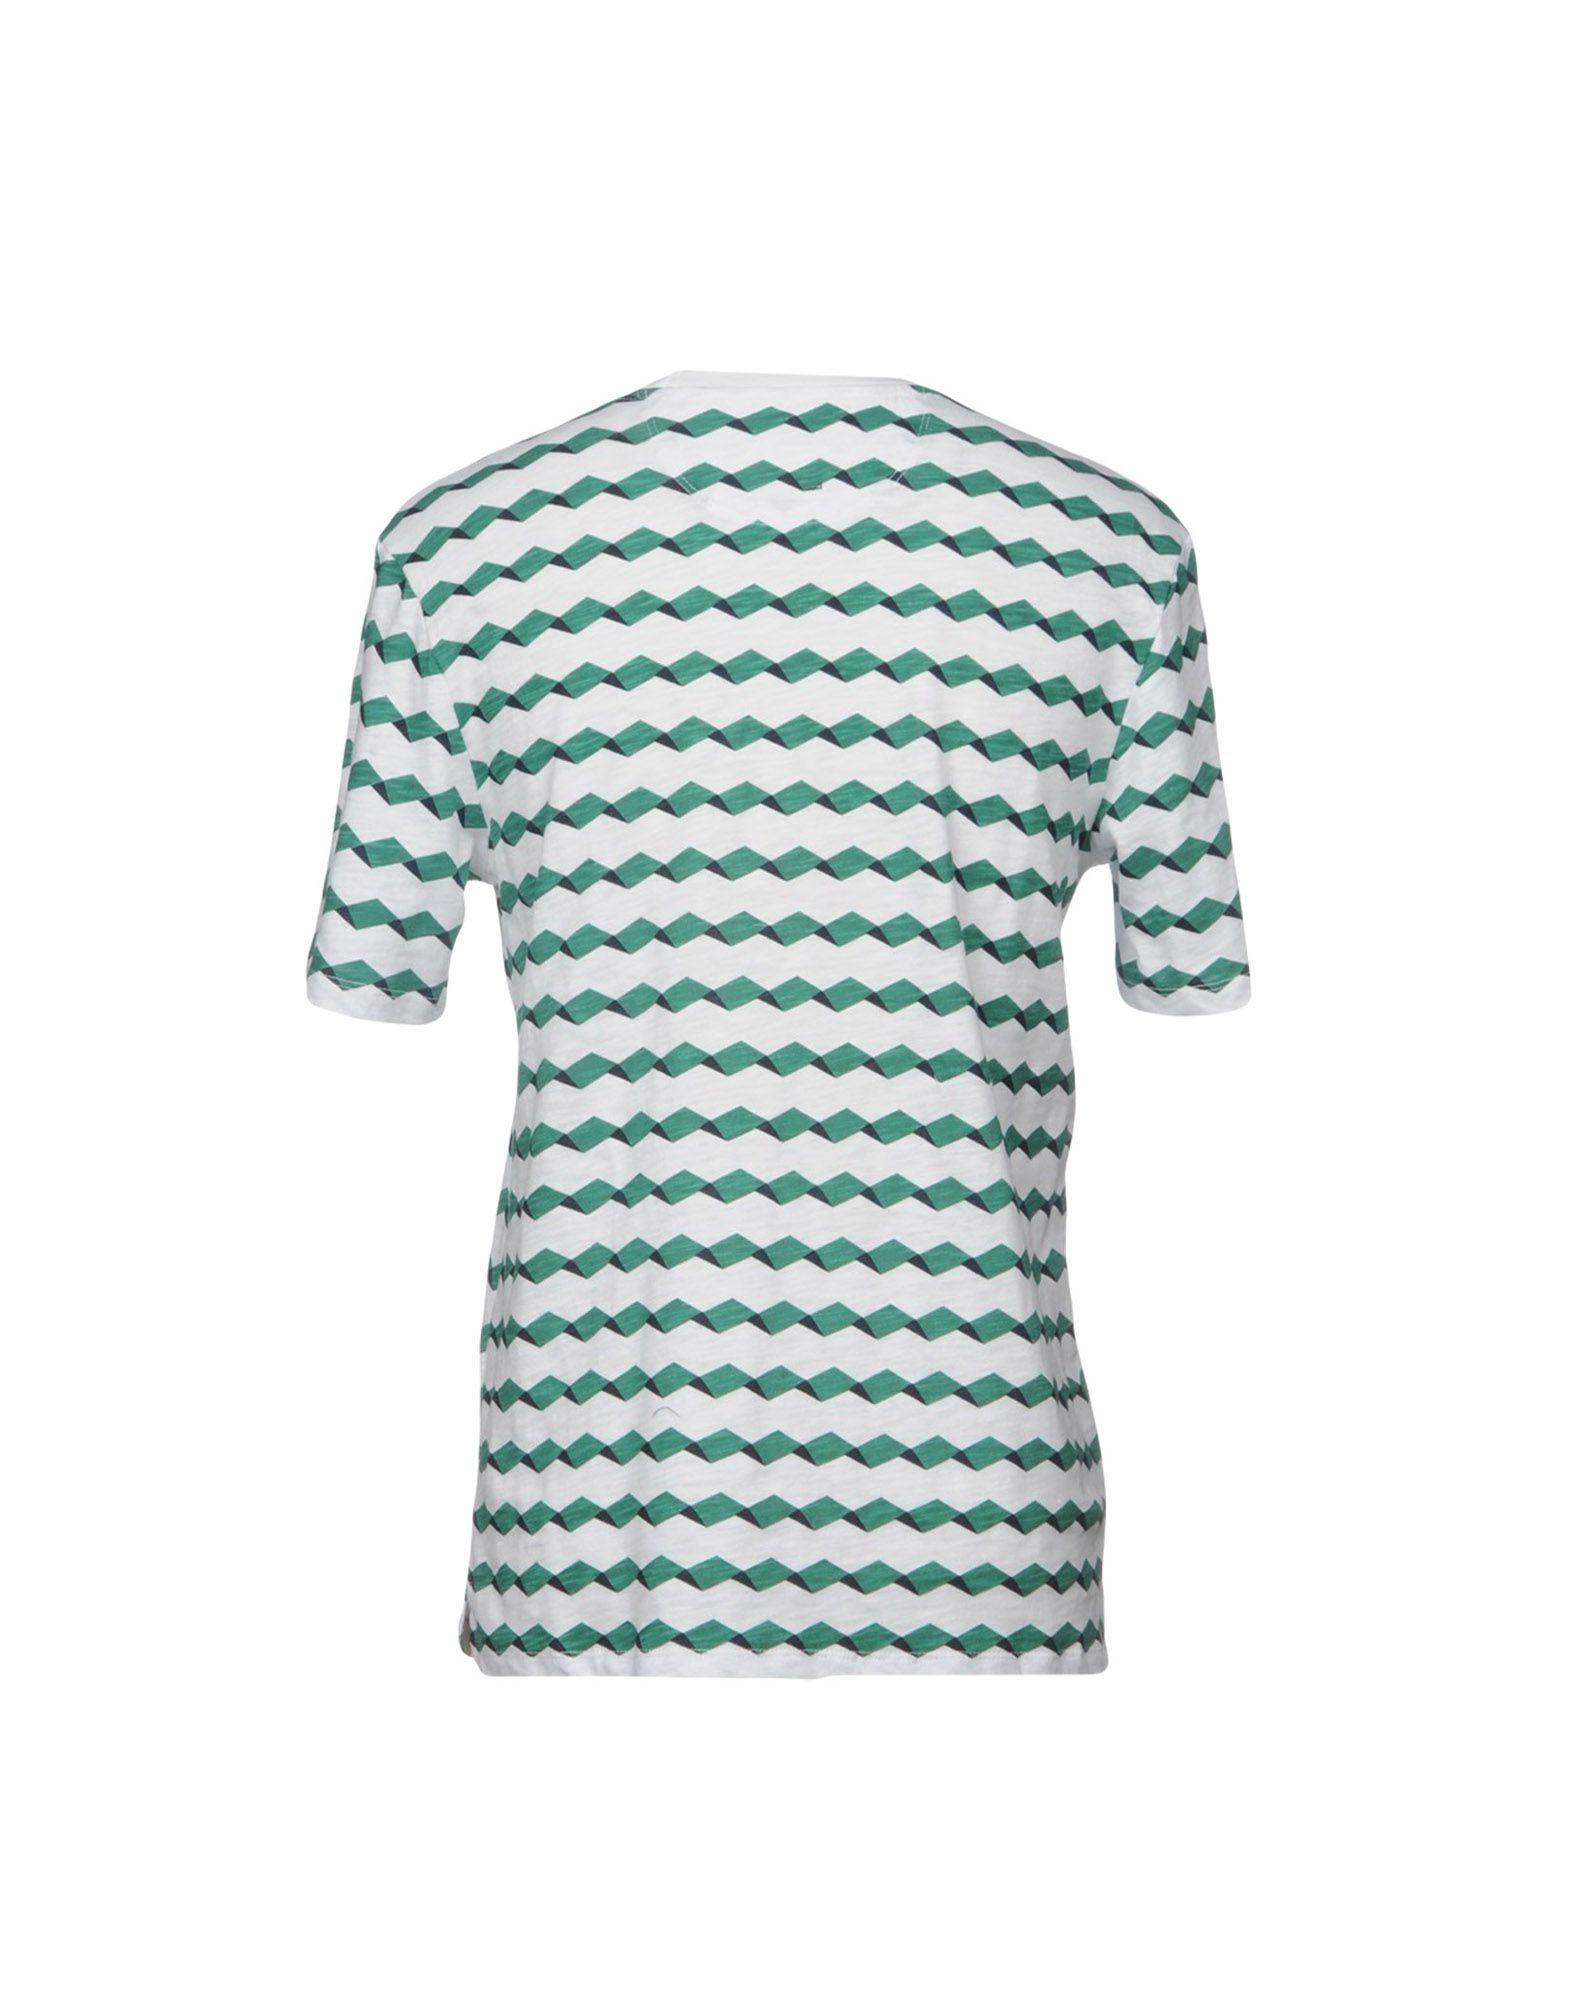 A buon mercato A buon mercato T-Shirt T-Shirt mercato Hymn Uomo - 12088257CG a430ce